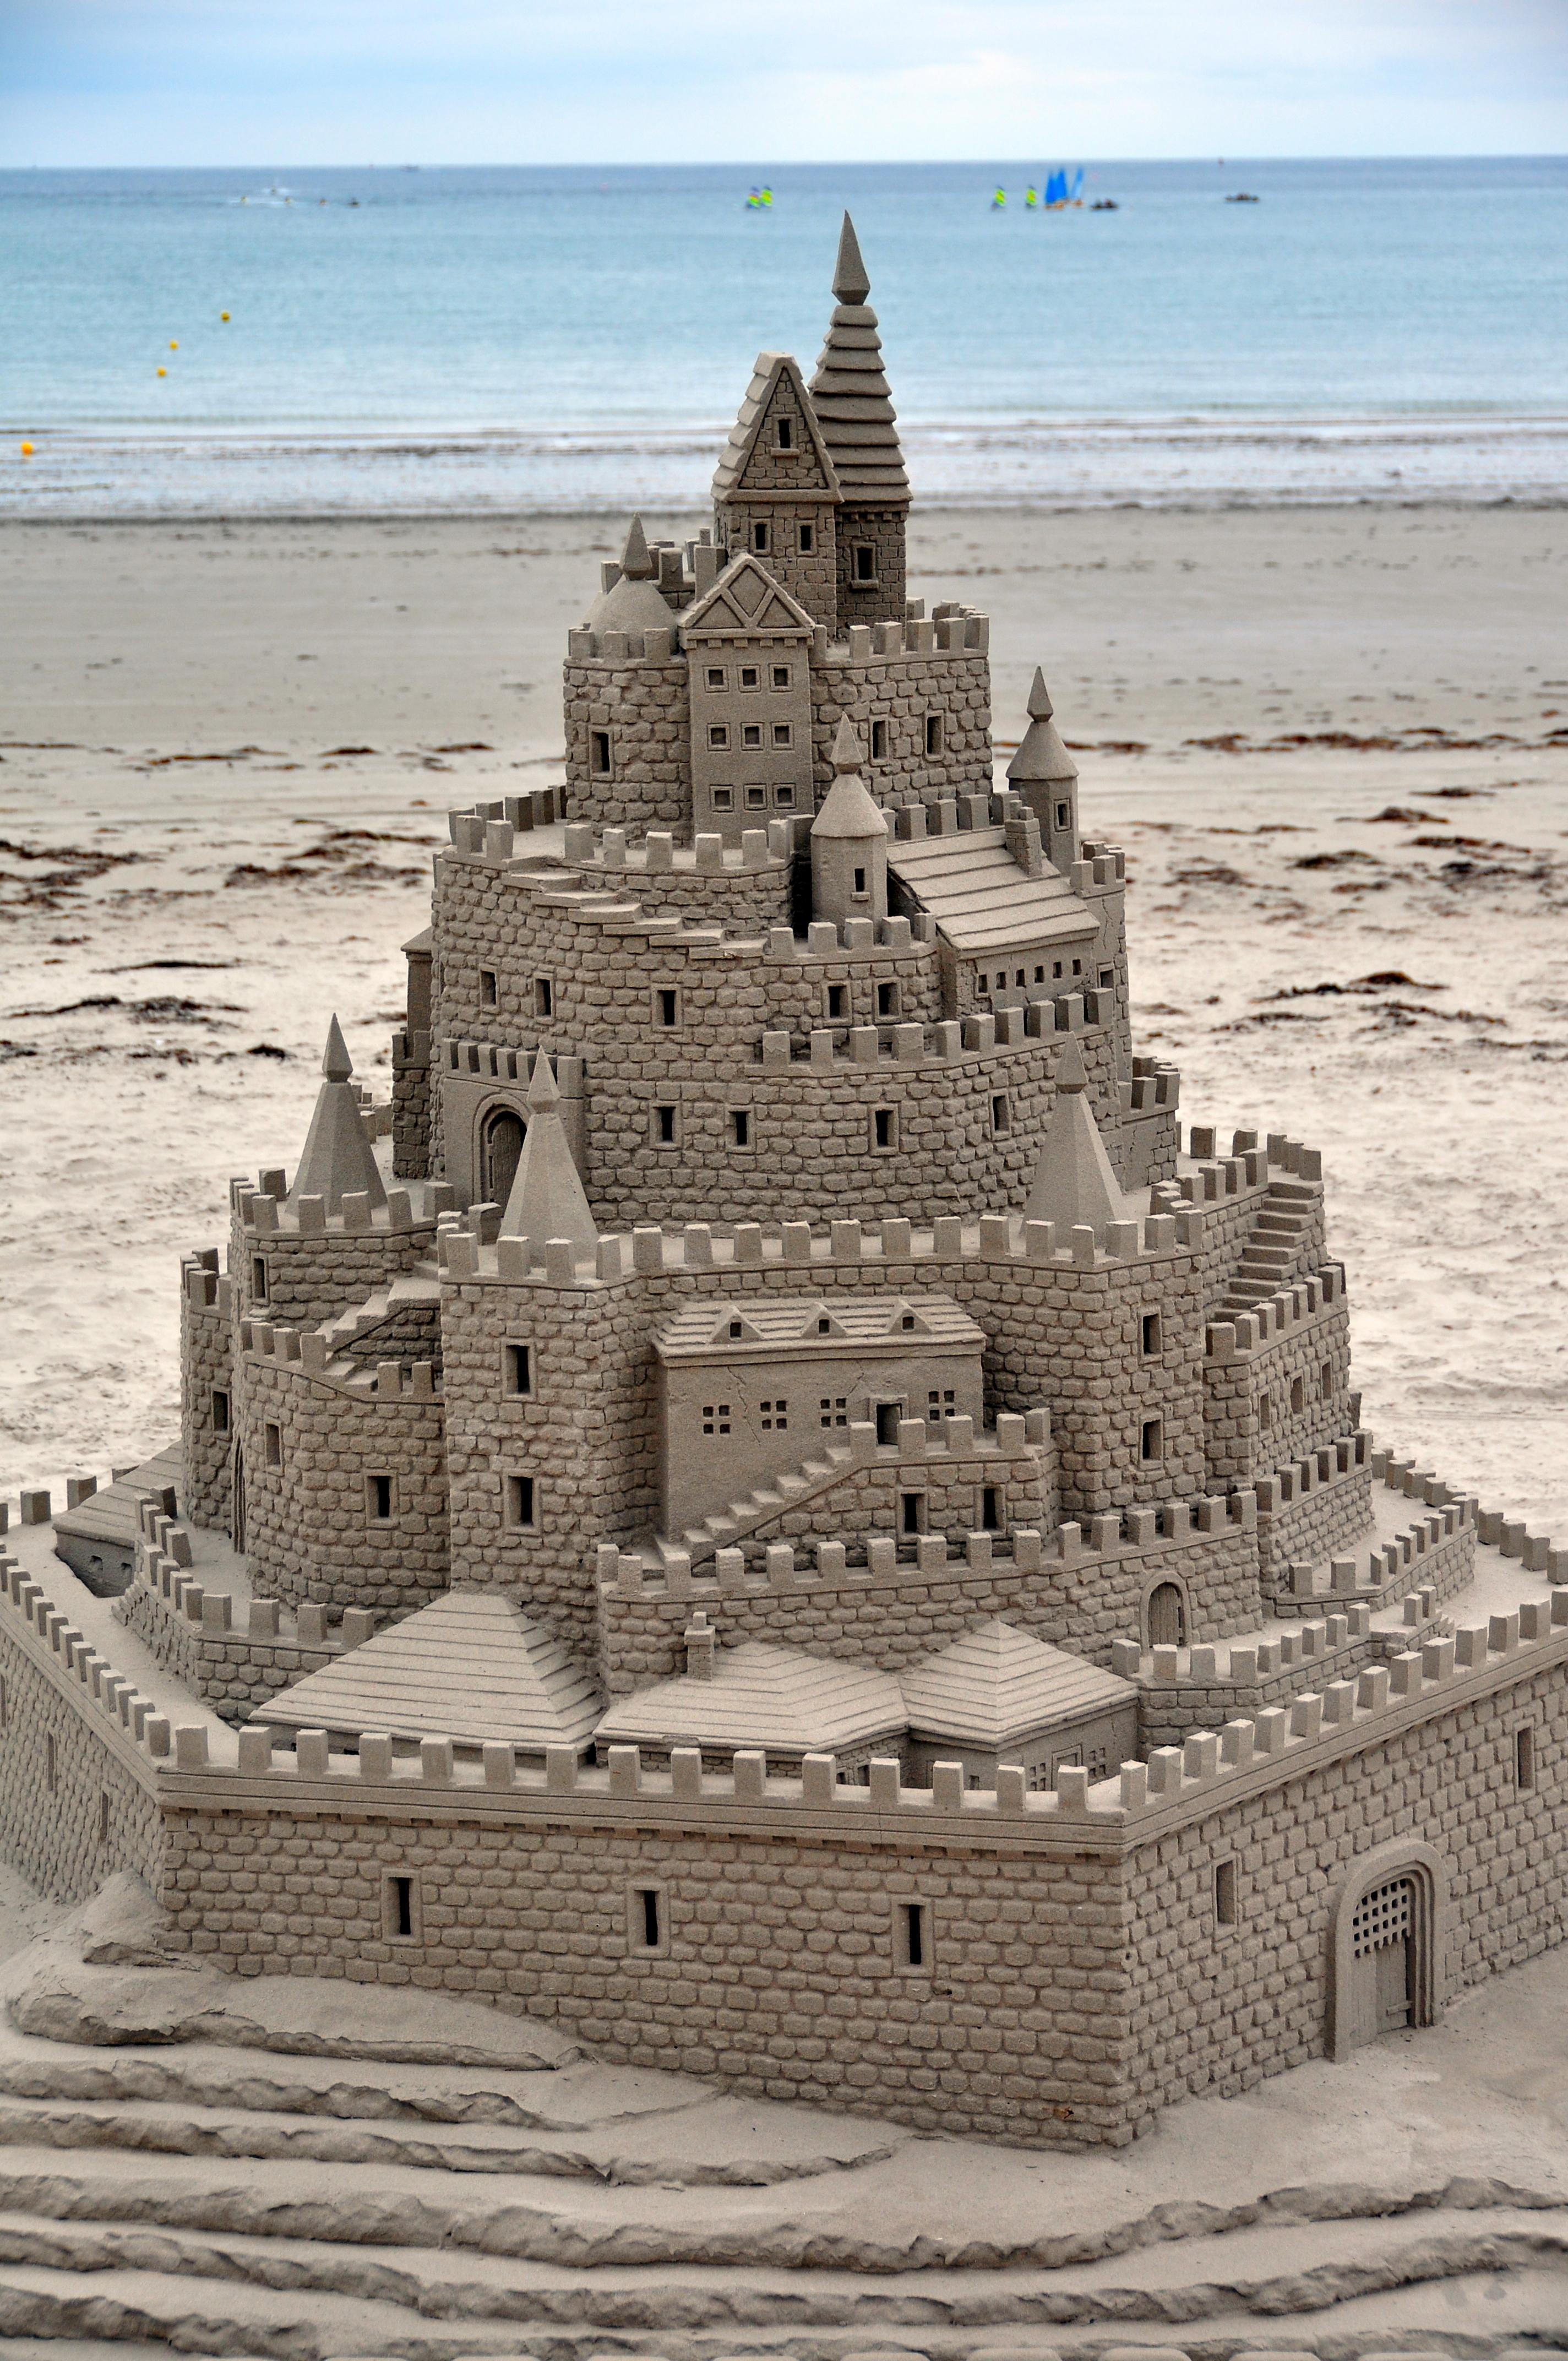 Building Sand Castles : Writing process building sandcastles lisa l hannett